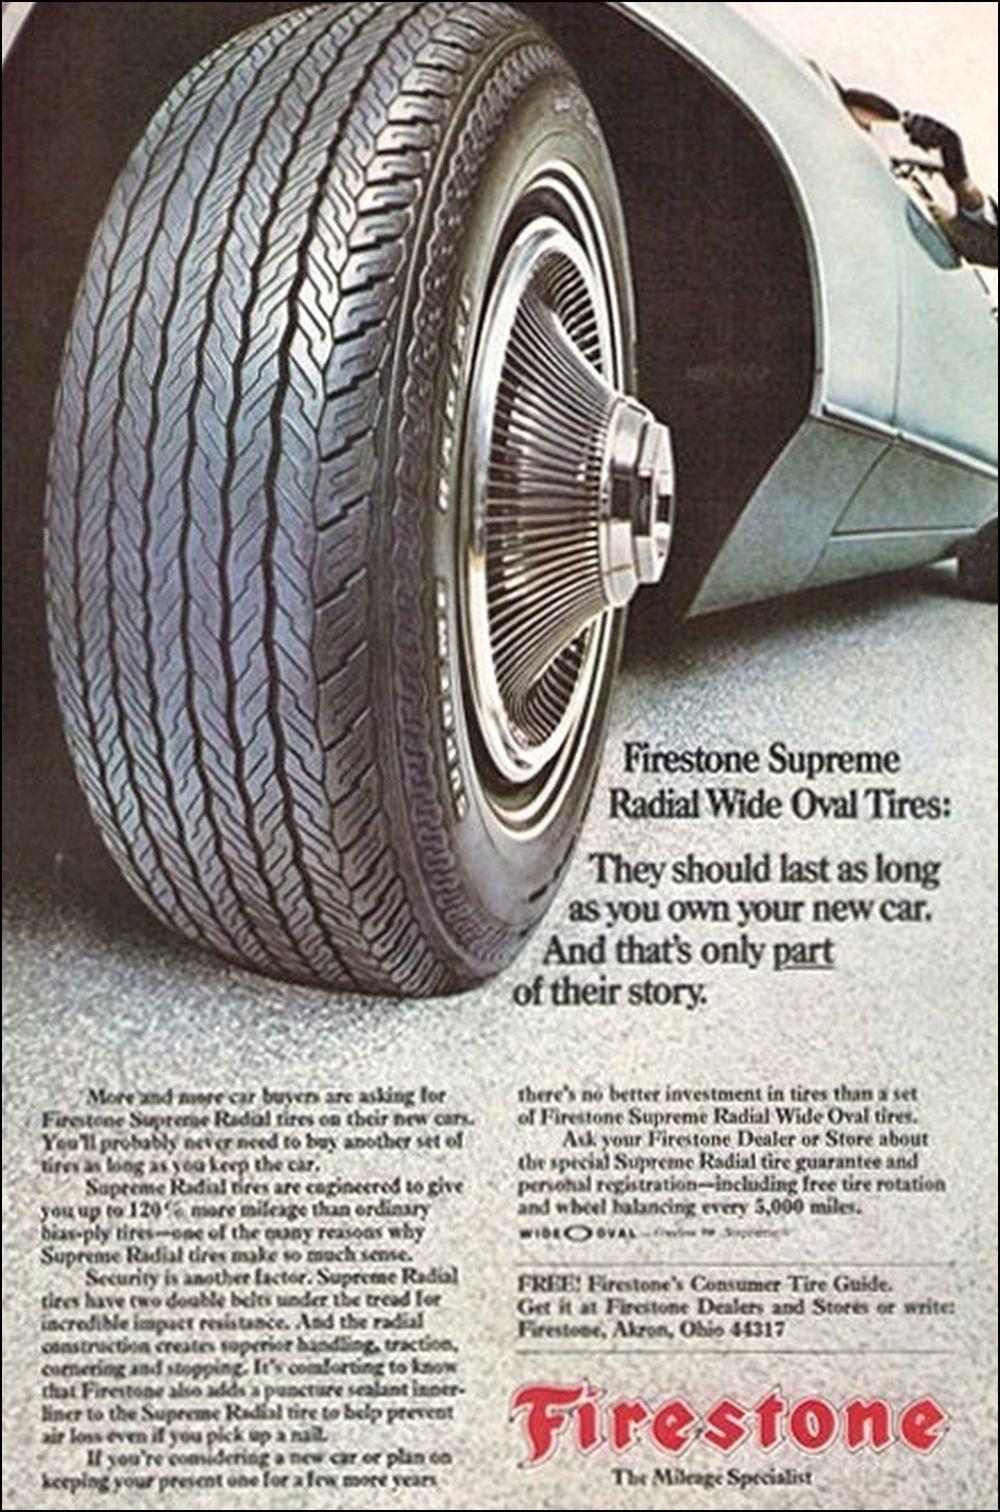 Firestone Tires Columbia Mo Firestone Tires Firestone Vintage Ads